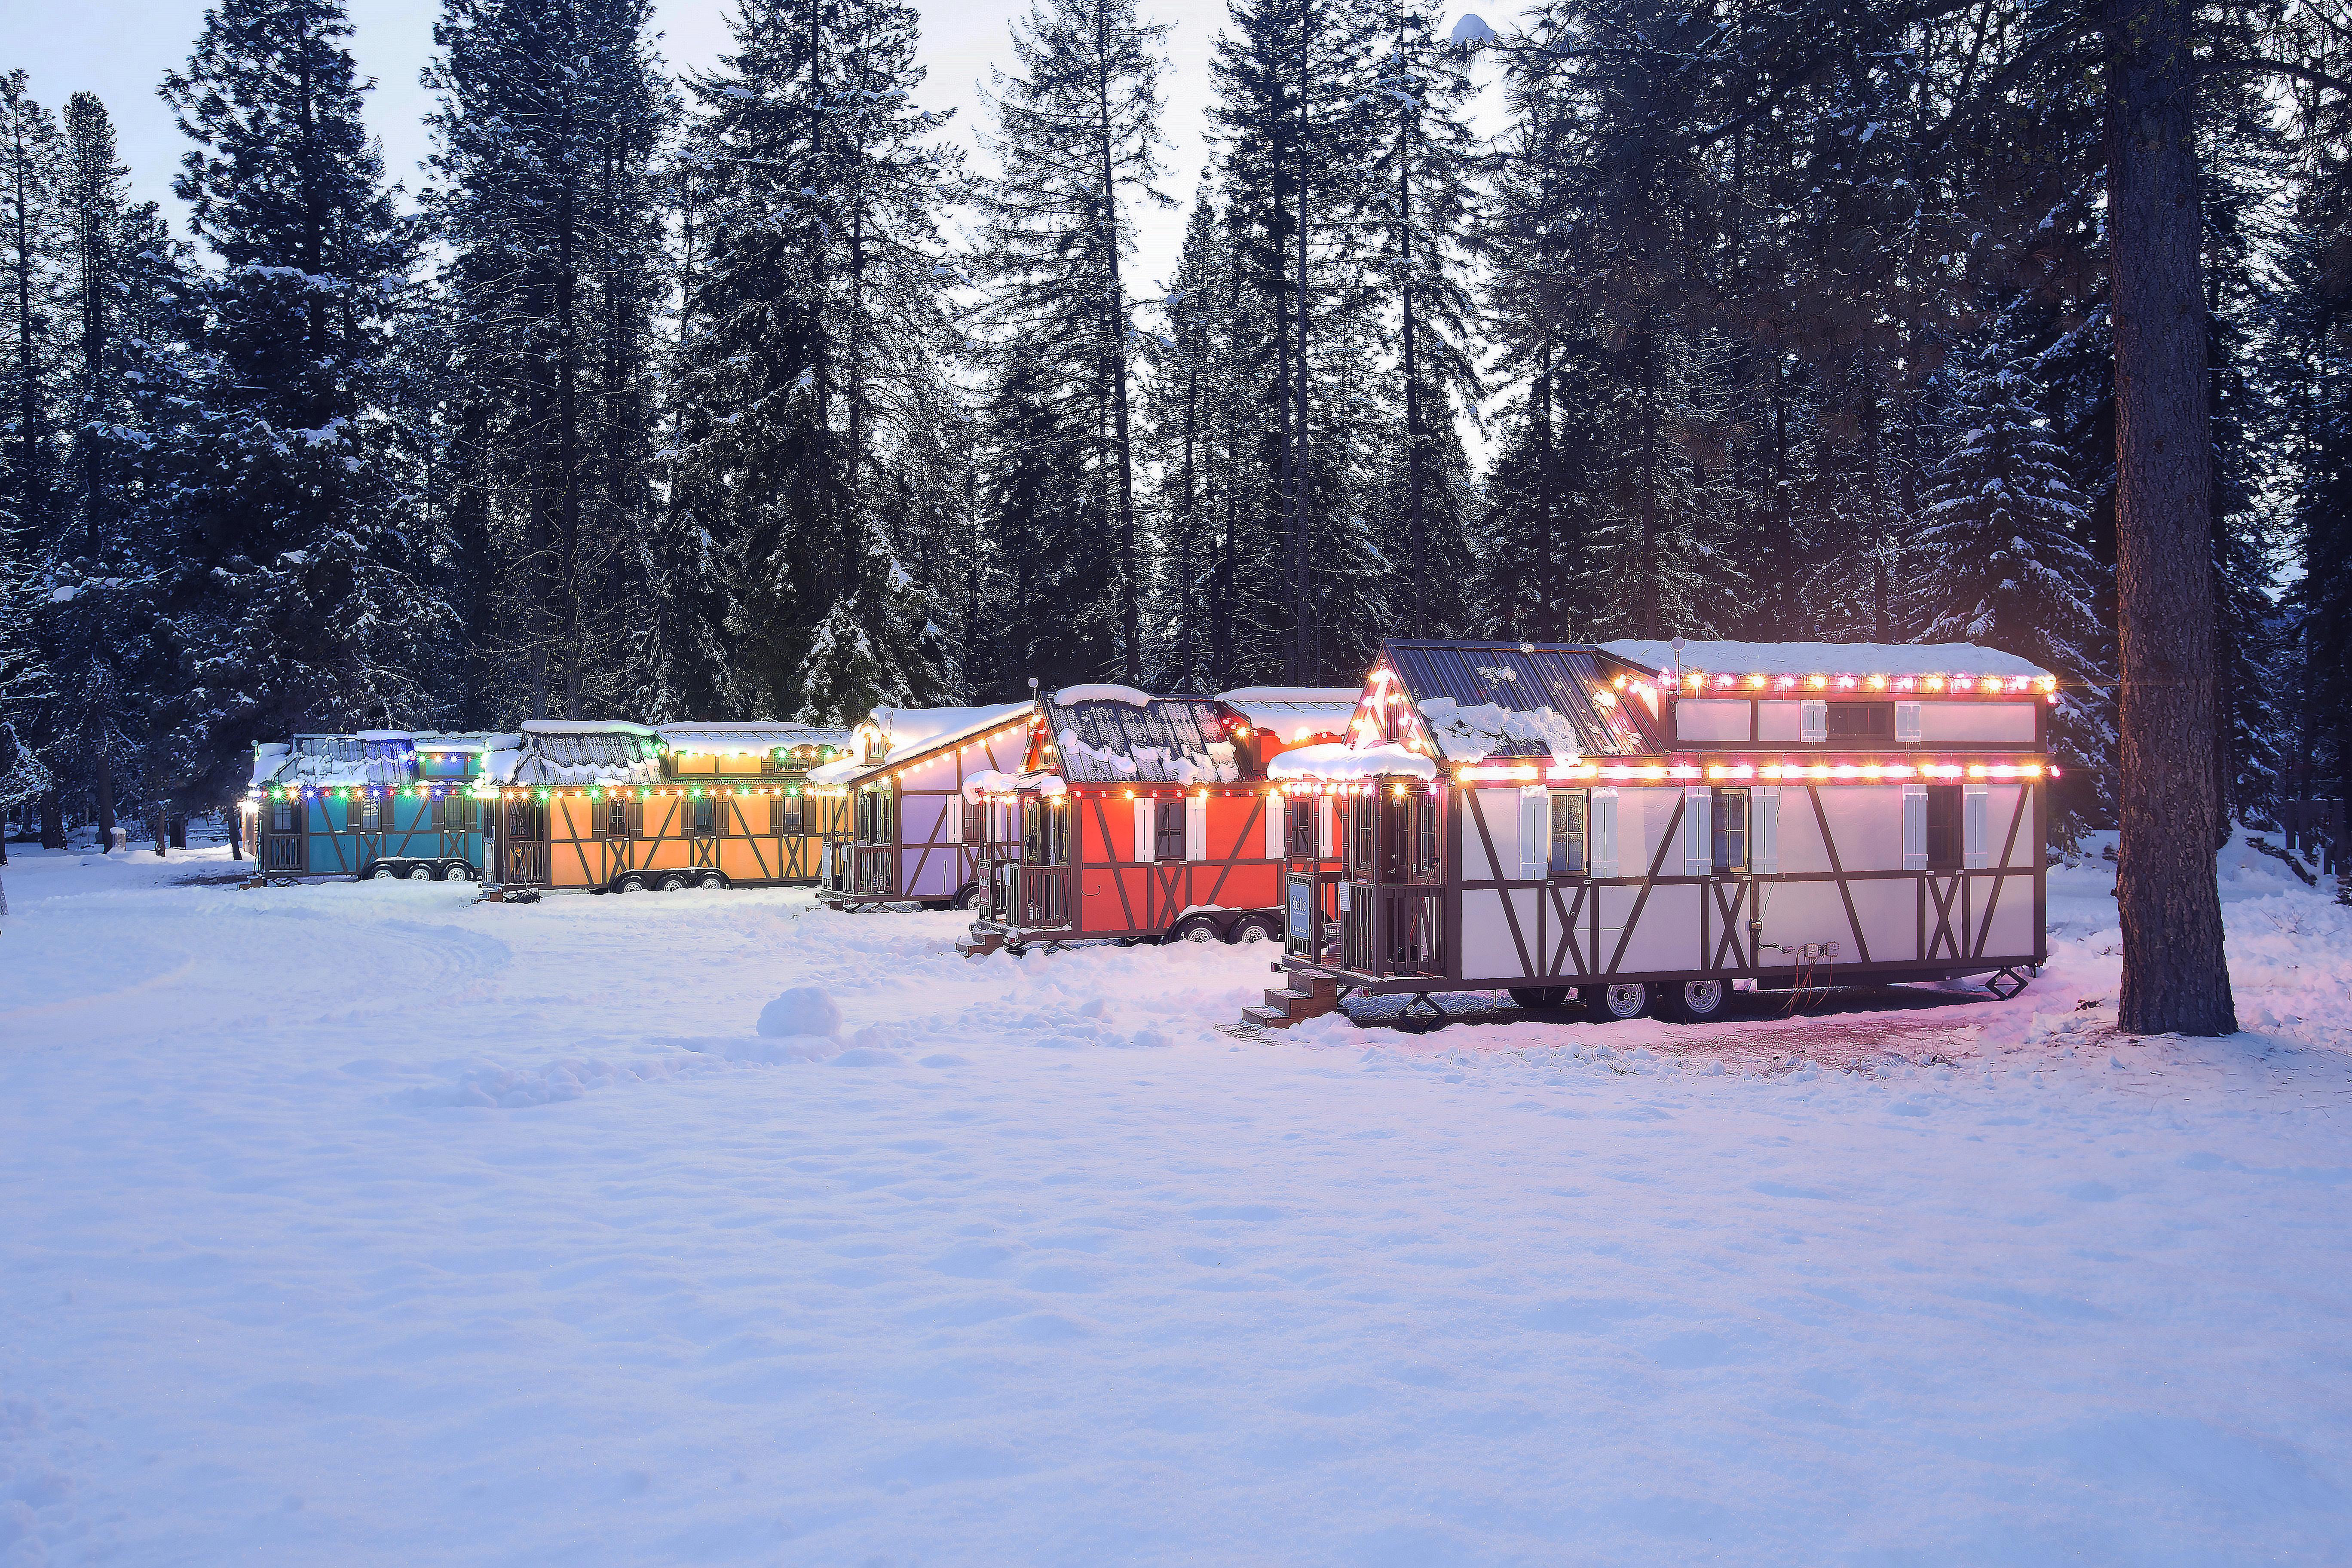 Visit The Little Bavarian Village Of Leavenworth